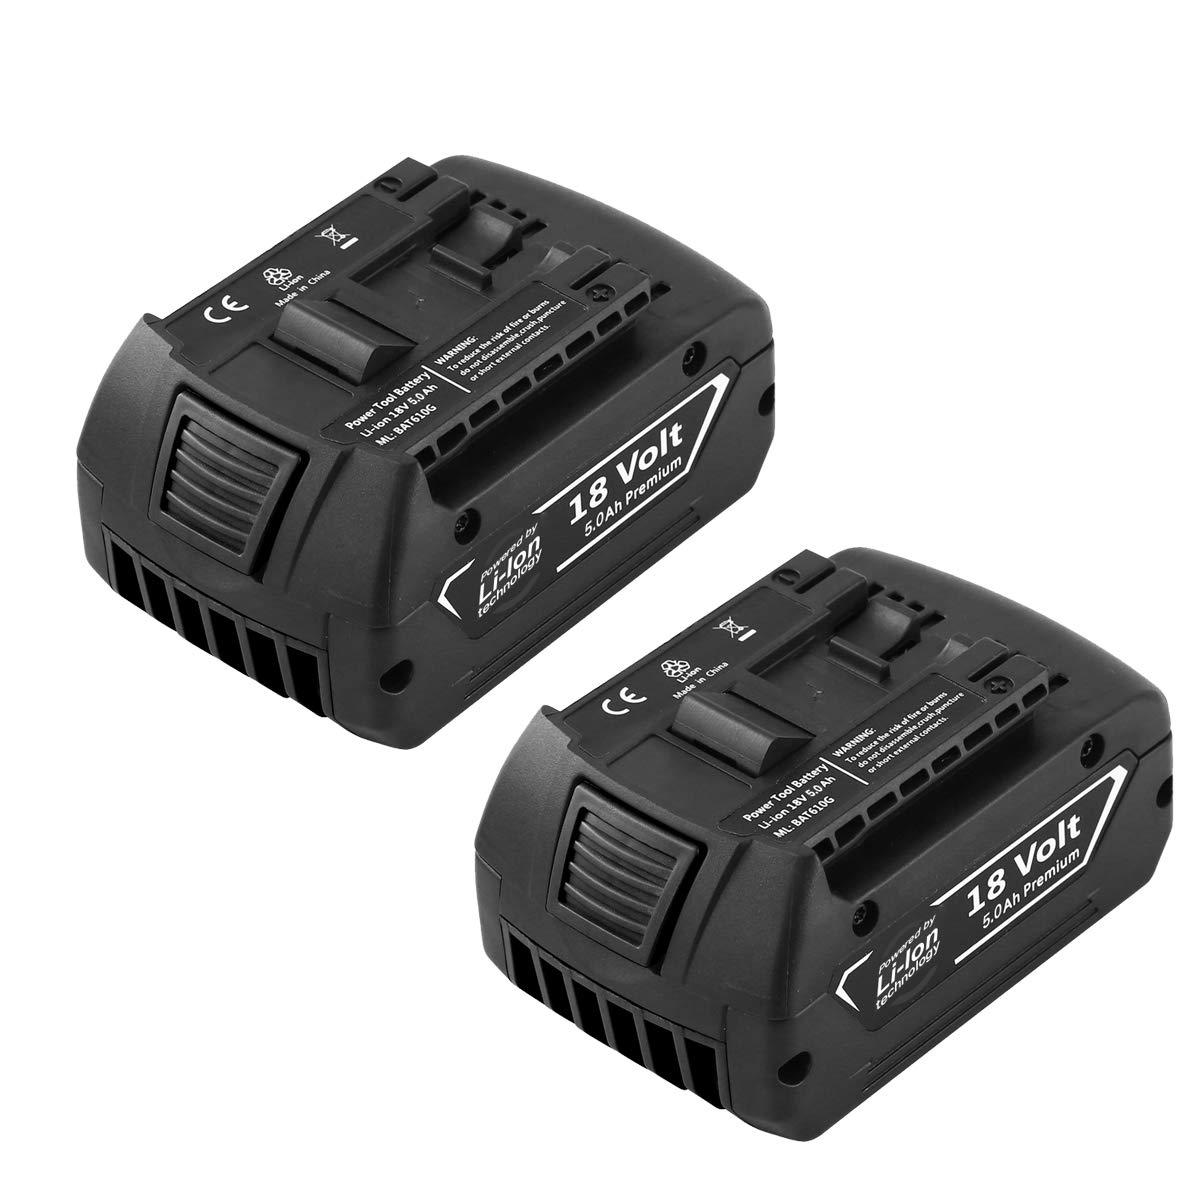 Forrat Replacement for Bosch 18V Battery 5.0Ah Lithium ion Compatible for Bosch BAT609 BAT612 BAT619G BAT620 SKC181-02 for Bosch 18 Volt Batteries 2Packs by Forrat